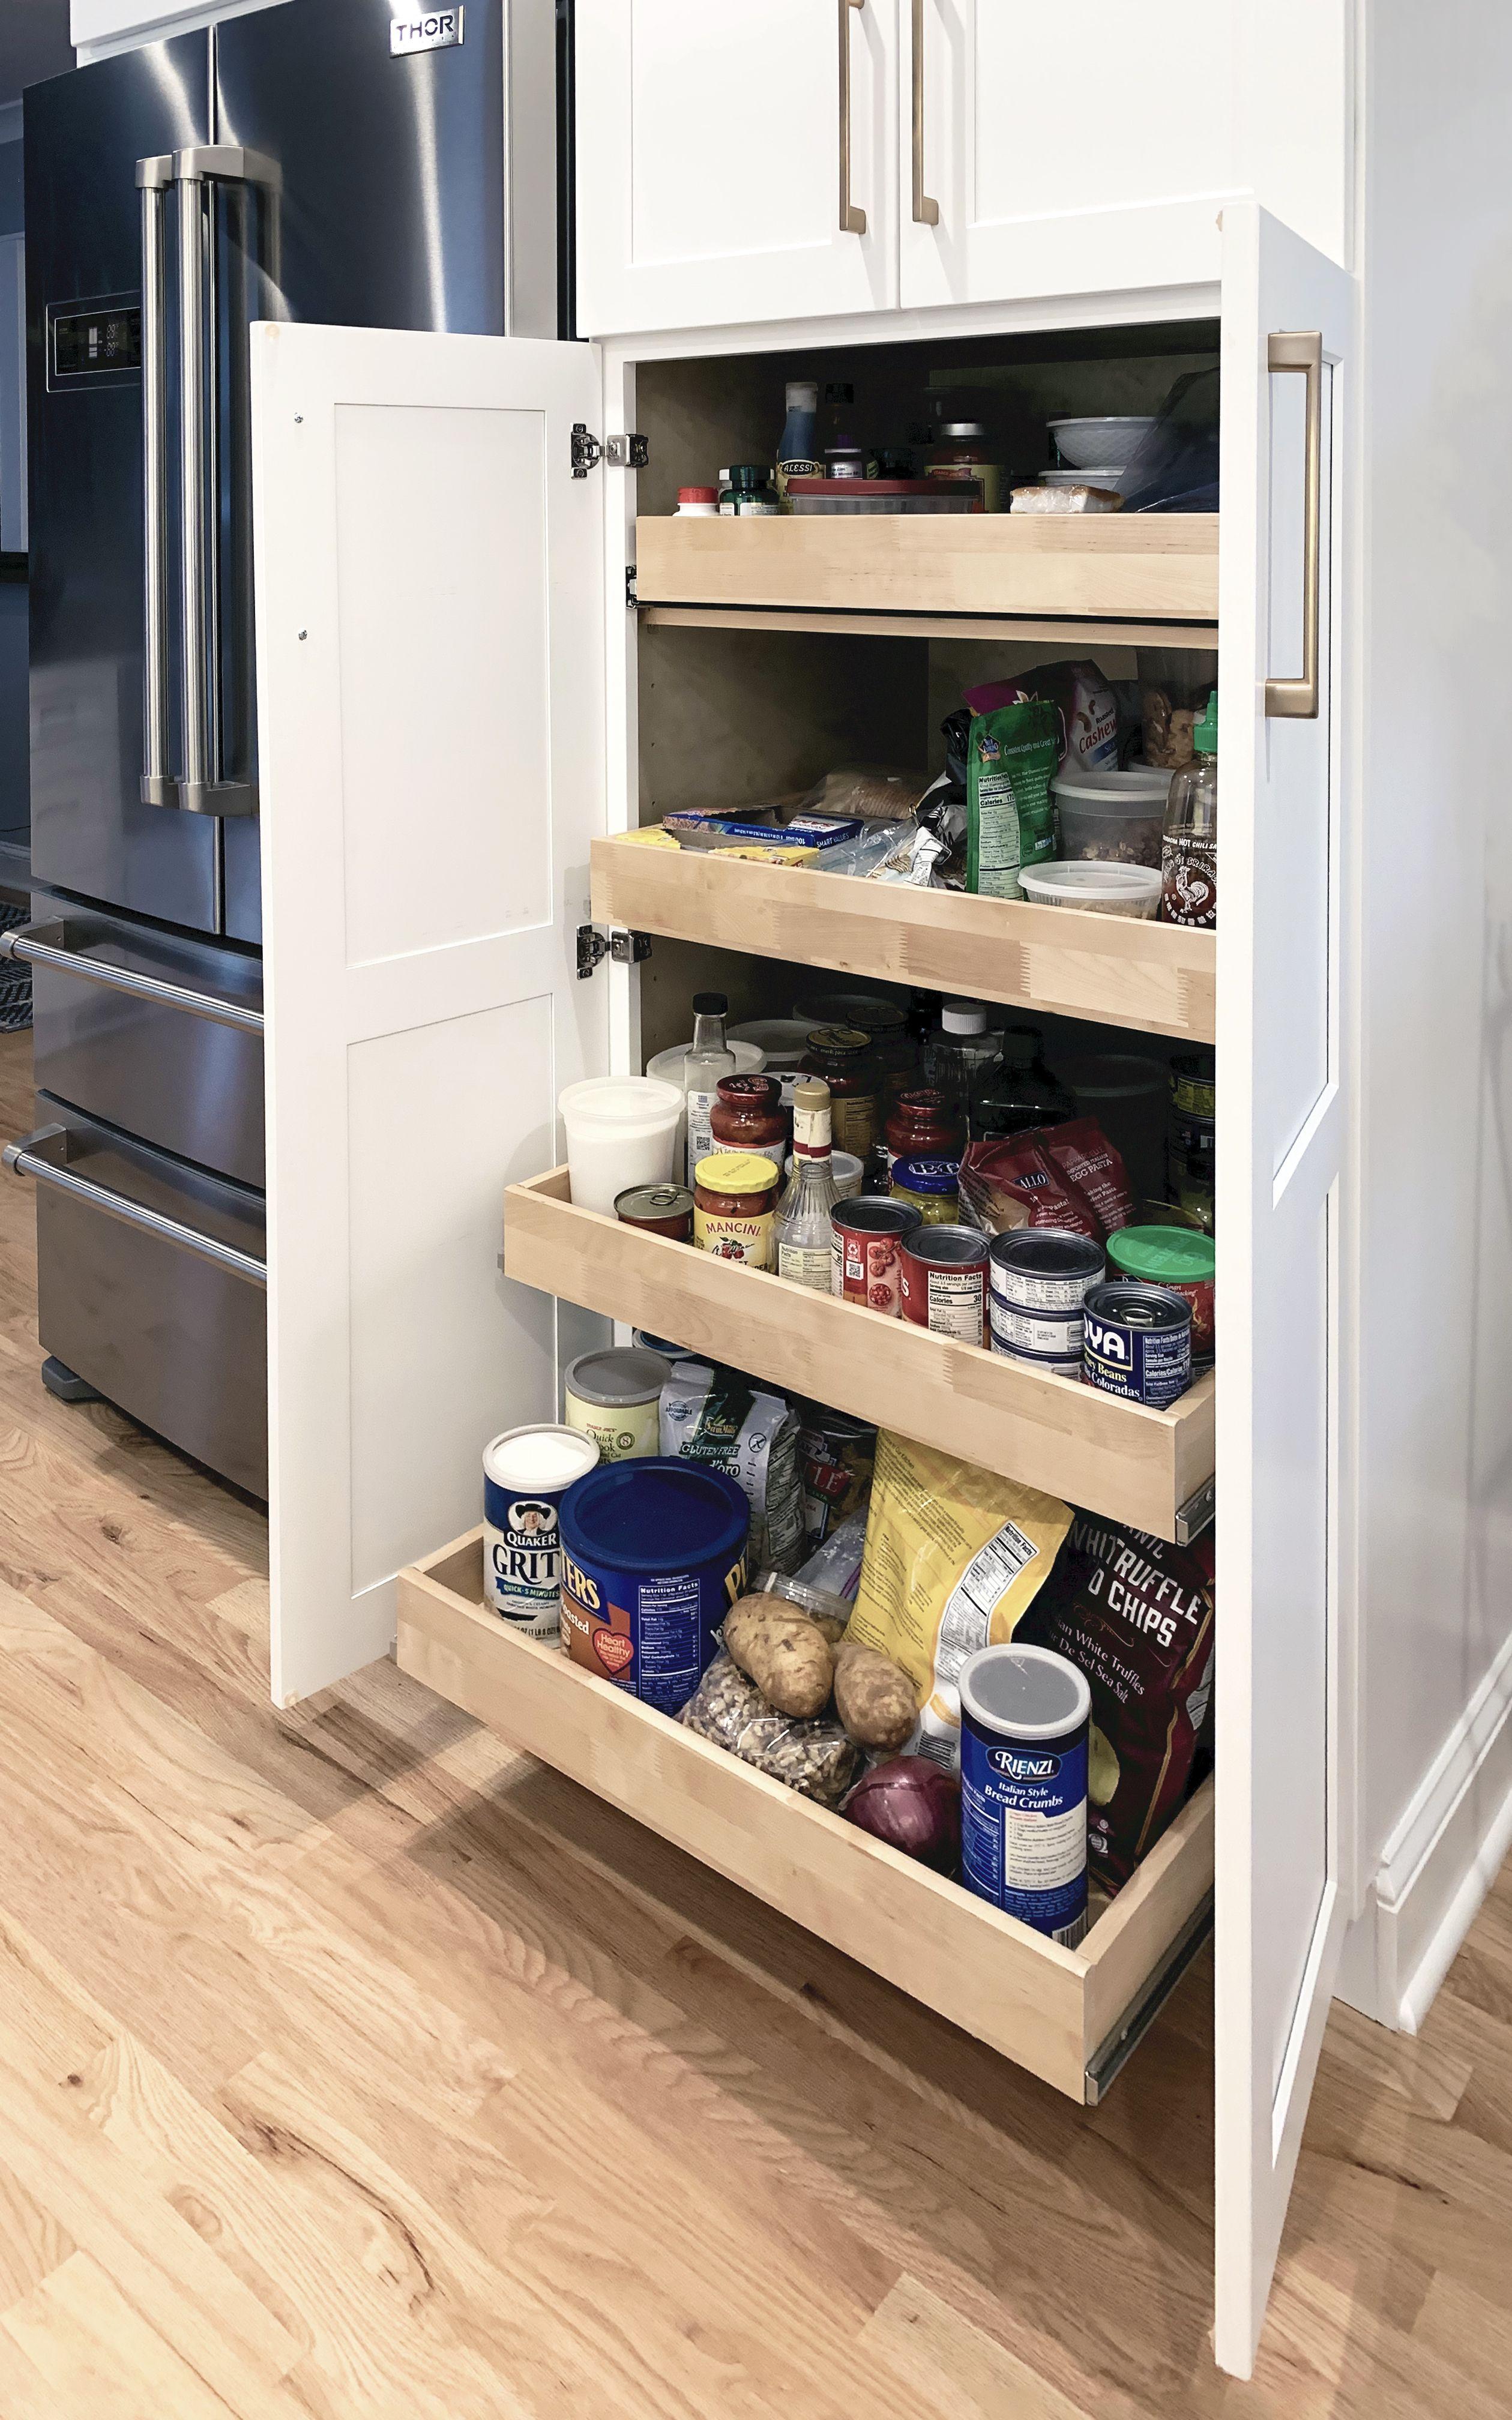 Pantry Storage Shelves Kitchen Pantry Design Building Kitchen Cabinets Free Standing Kitchen Pantry